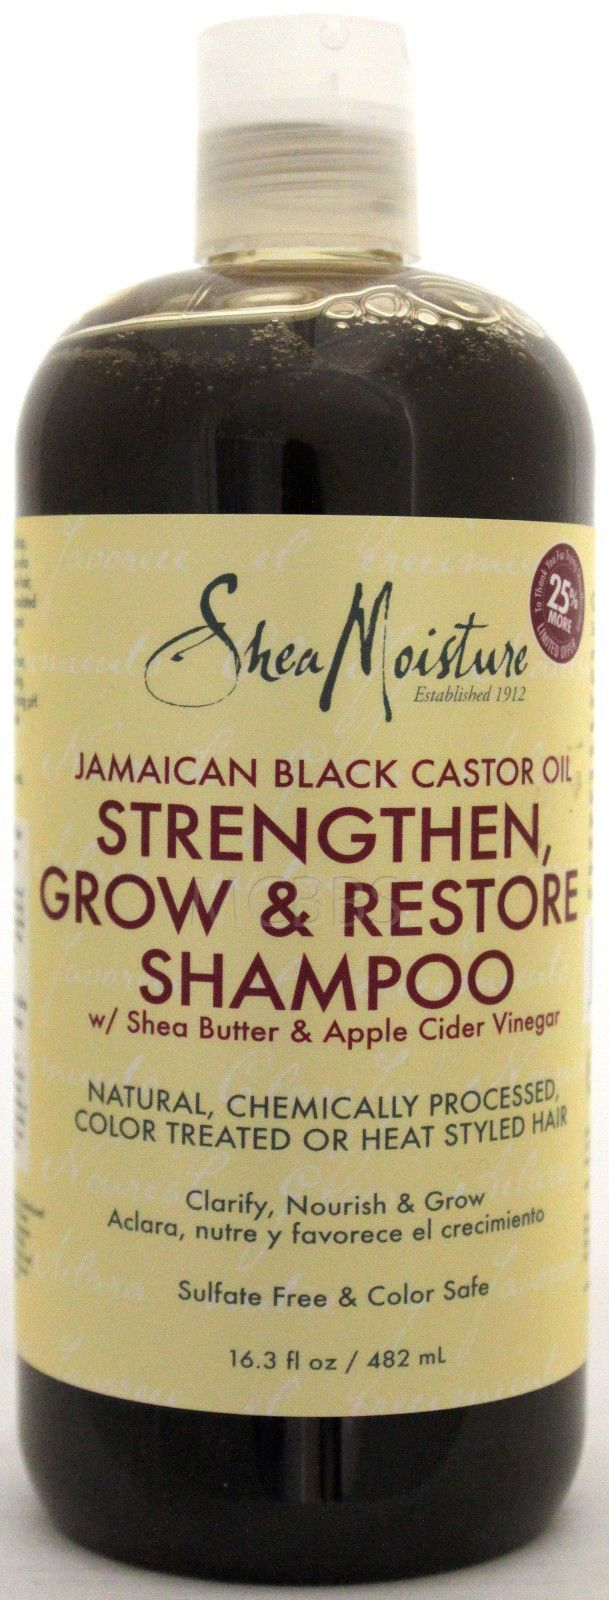 Shea moisture jamaican black castor oil shampoo apple cider vinegar